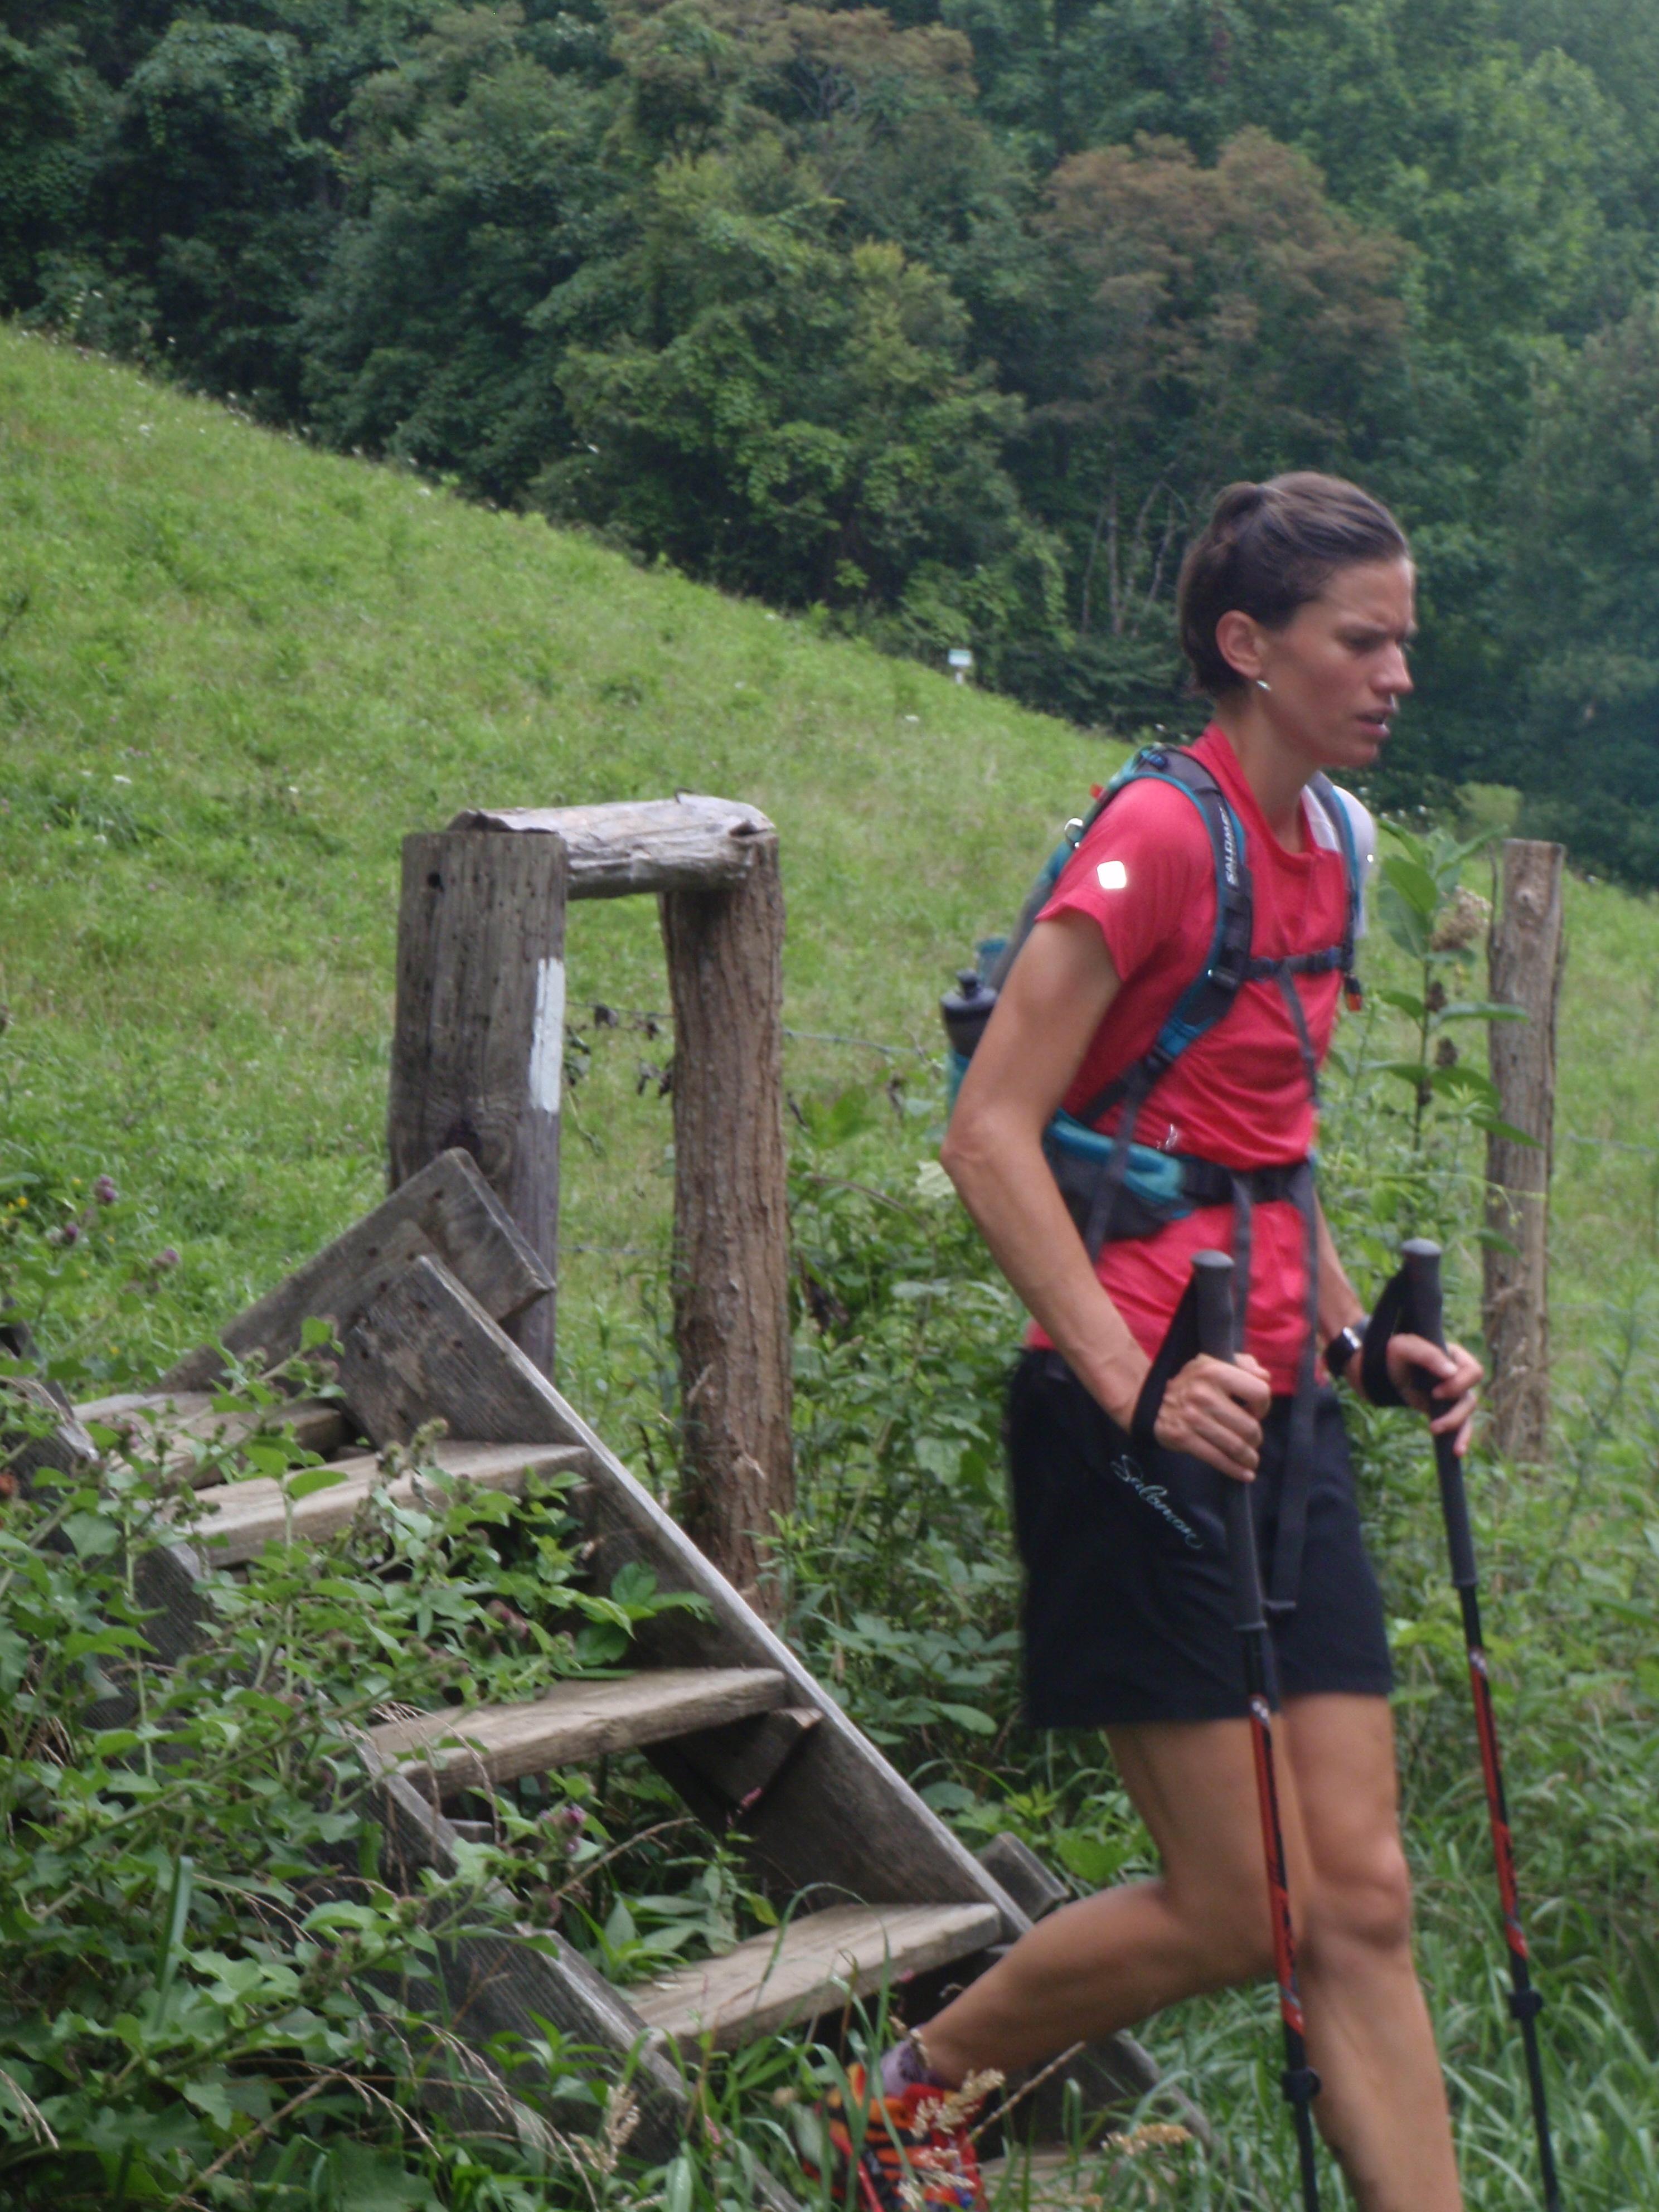 National Geographic Adventurer of the Year Jennifer Pharr